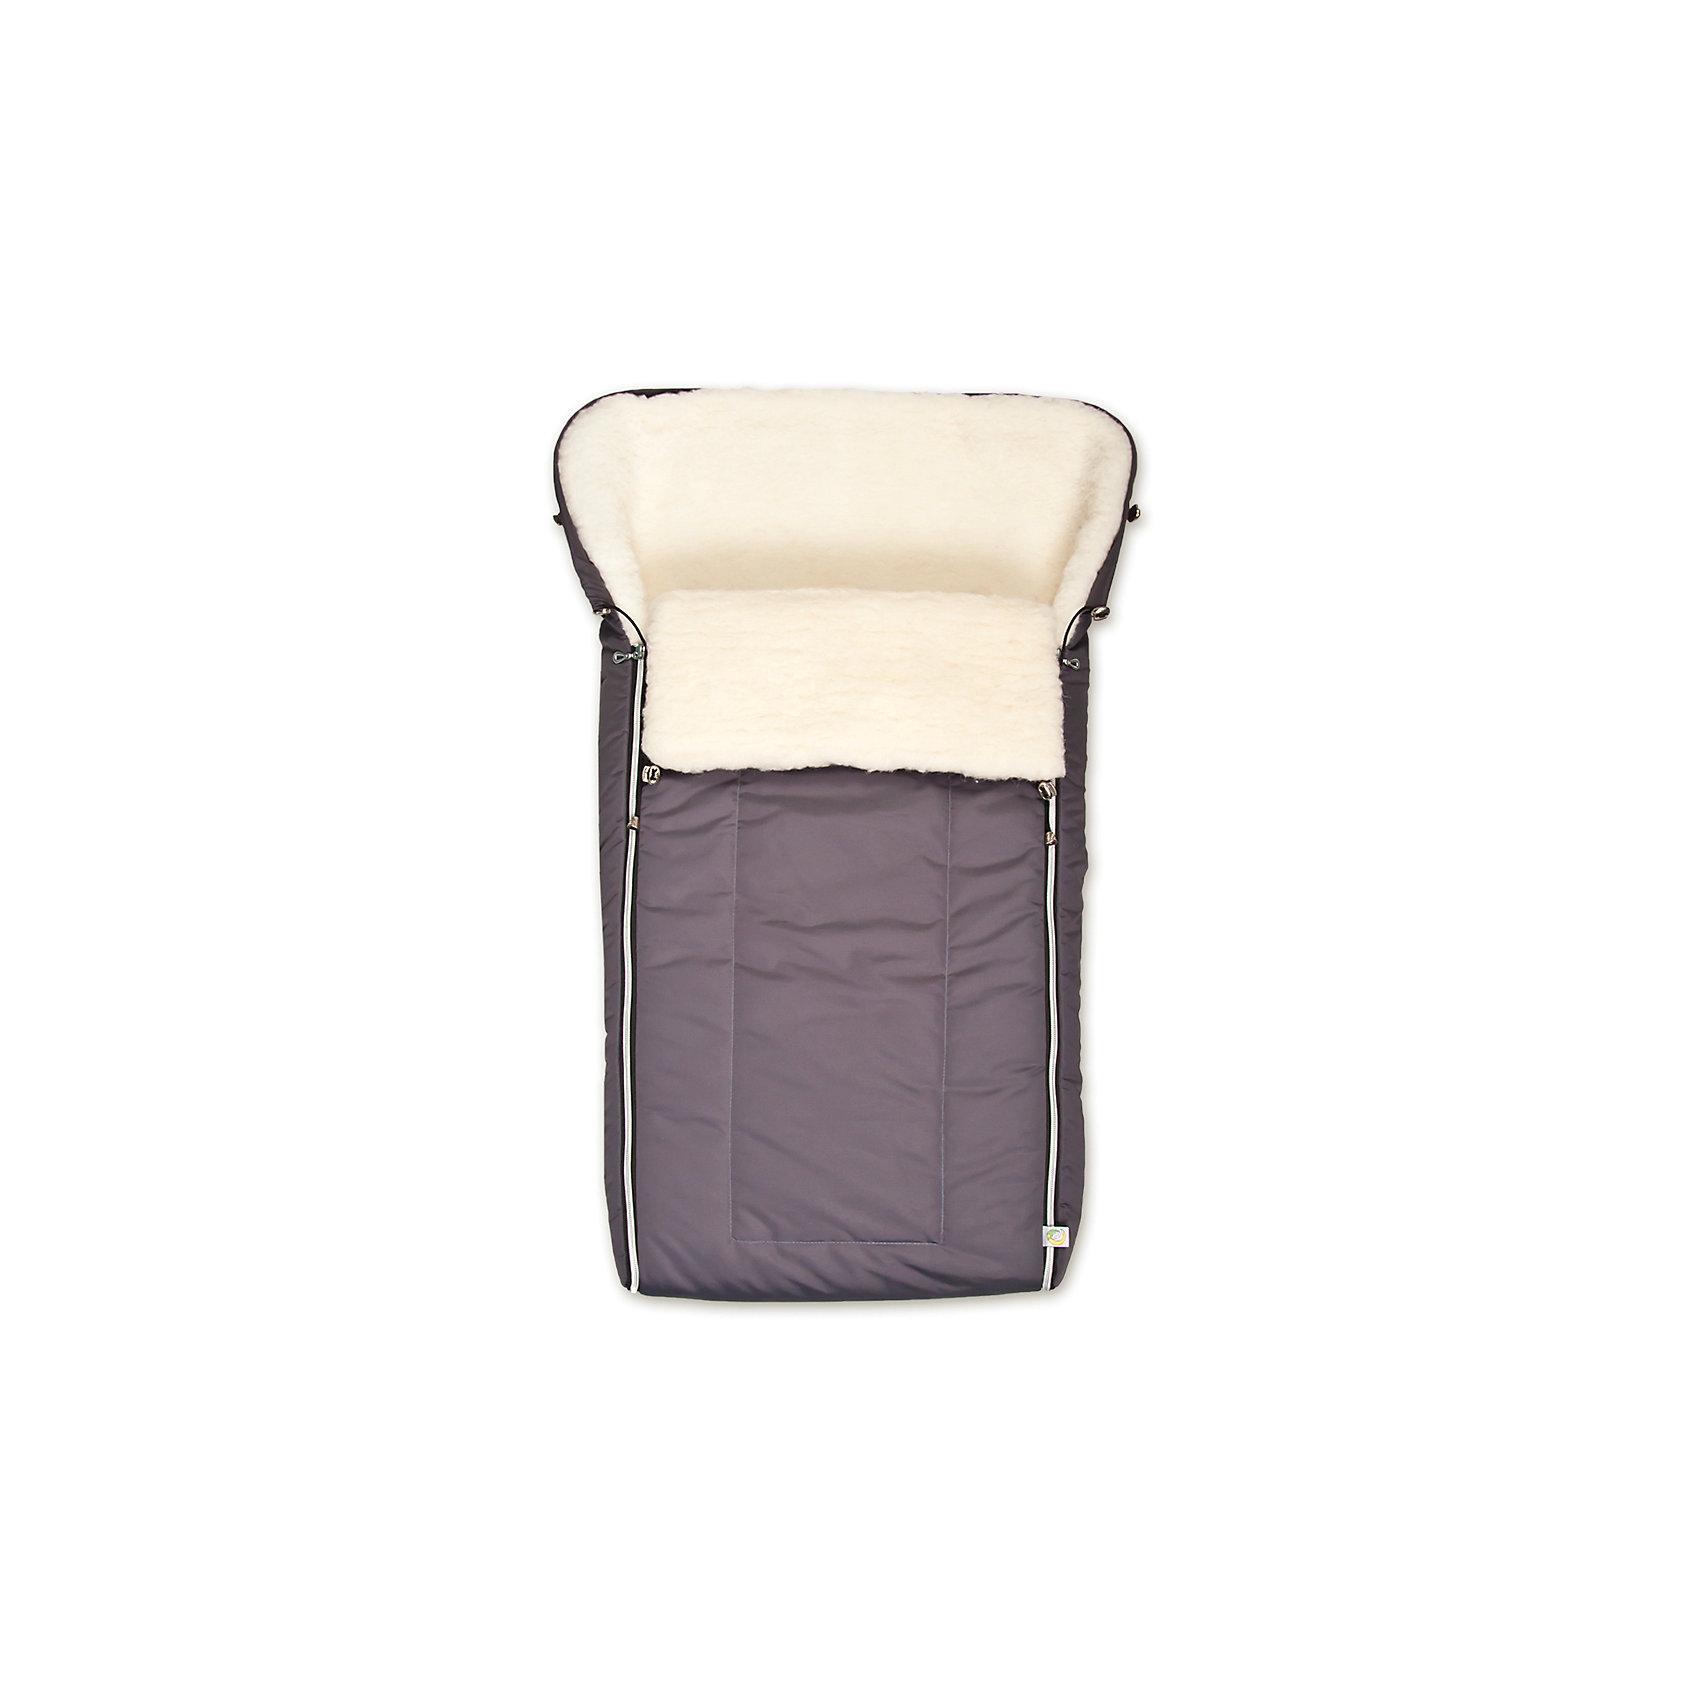 Сонный гномик Конверт в коляску Норд, Сонный гномик, серый сонный гномик конверт зимний норд серый